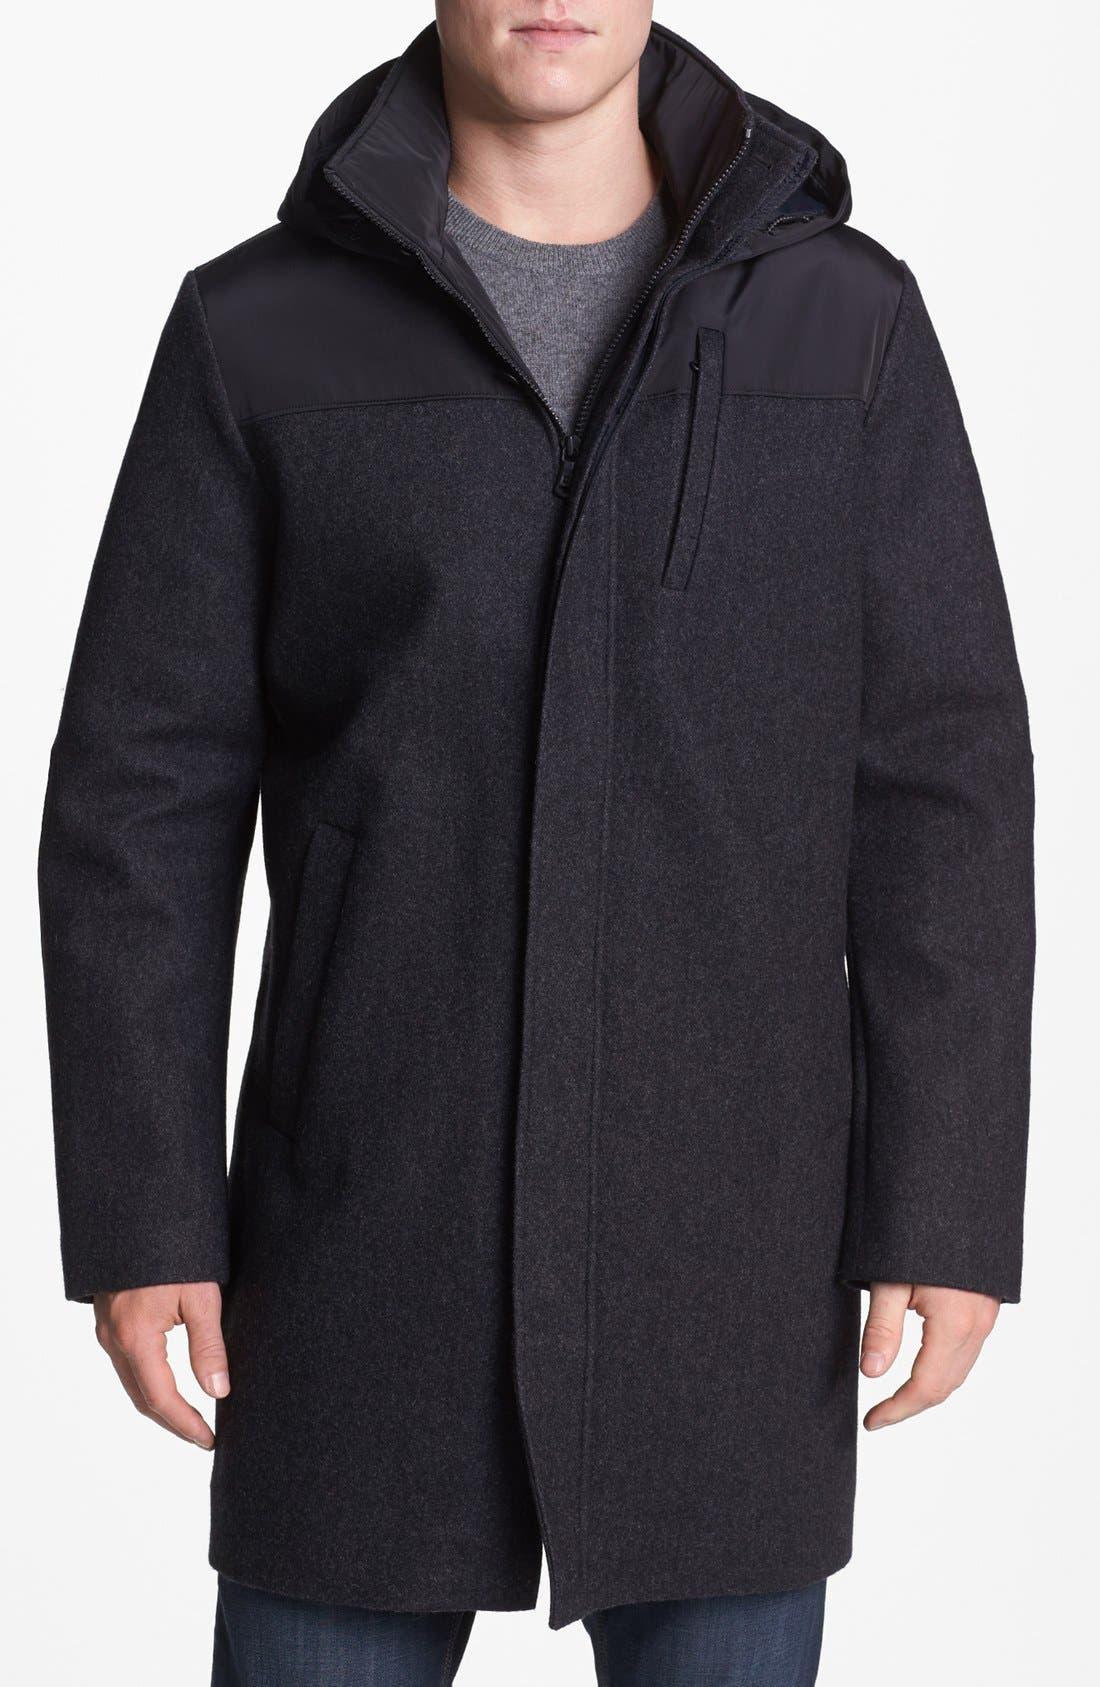 Alternate Image 1 Selected - Victorinox Swiss Army® 'Shuttle' Wool Blend Coat